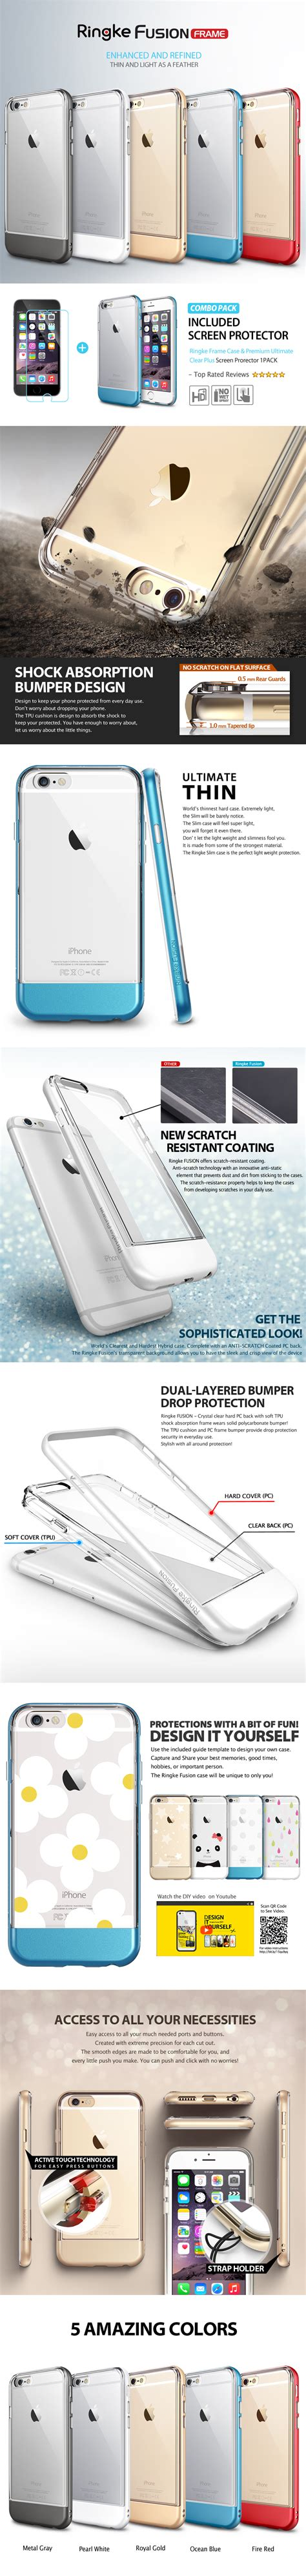 Rearth Iphone 4 Ringke True Blue 1 wts ringke verus smartphone